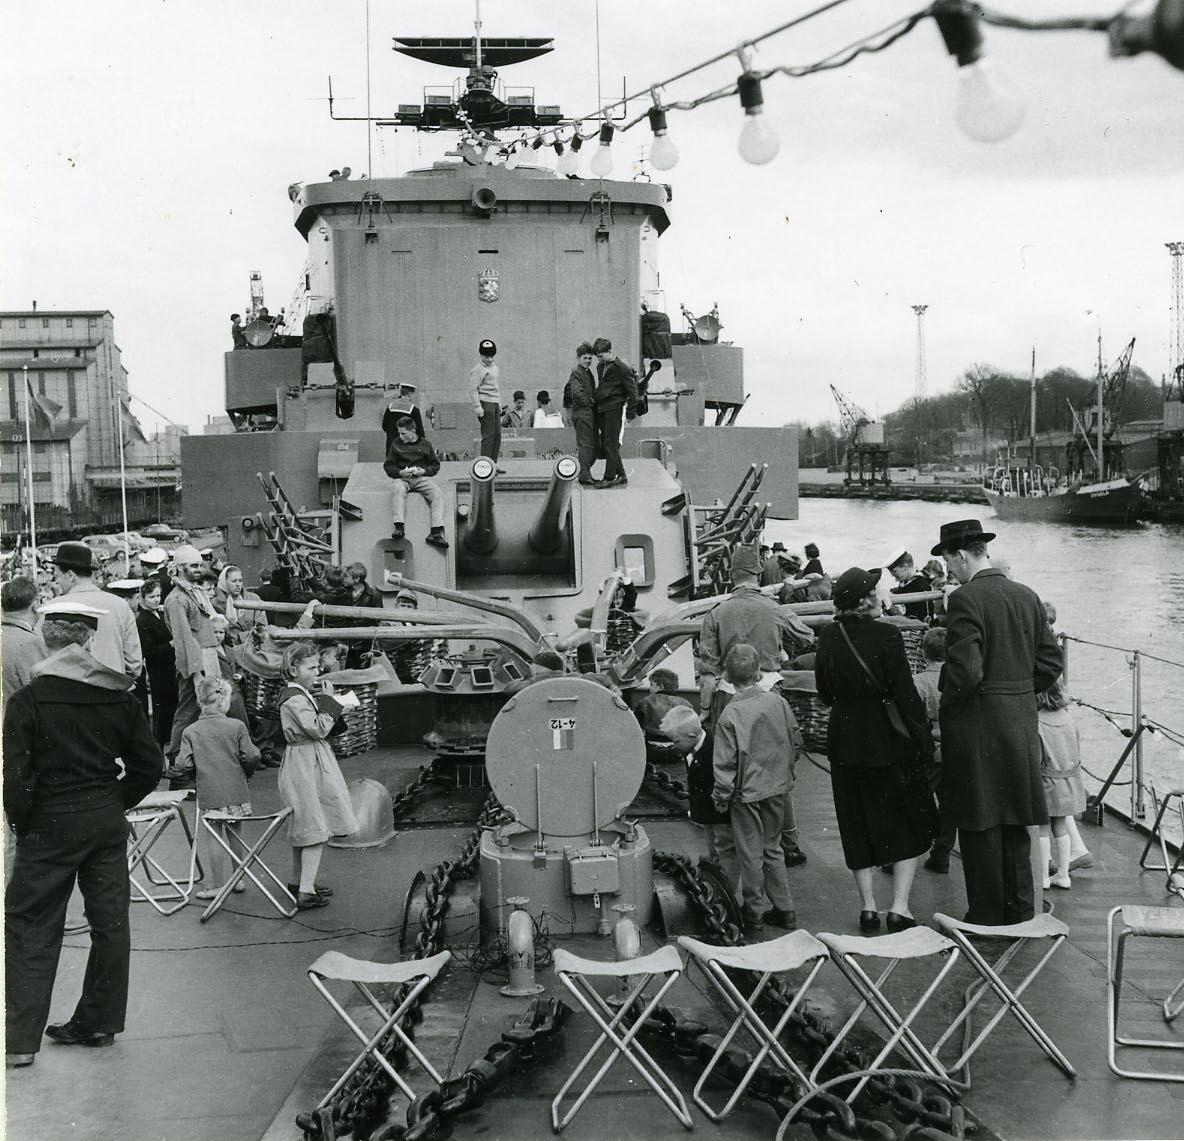 Besöksdag ombord på jagaren Östergötland i Norrköping maj 1958.